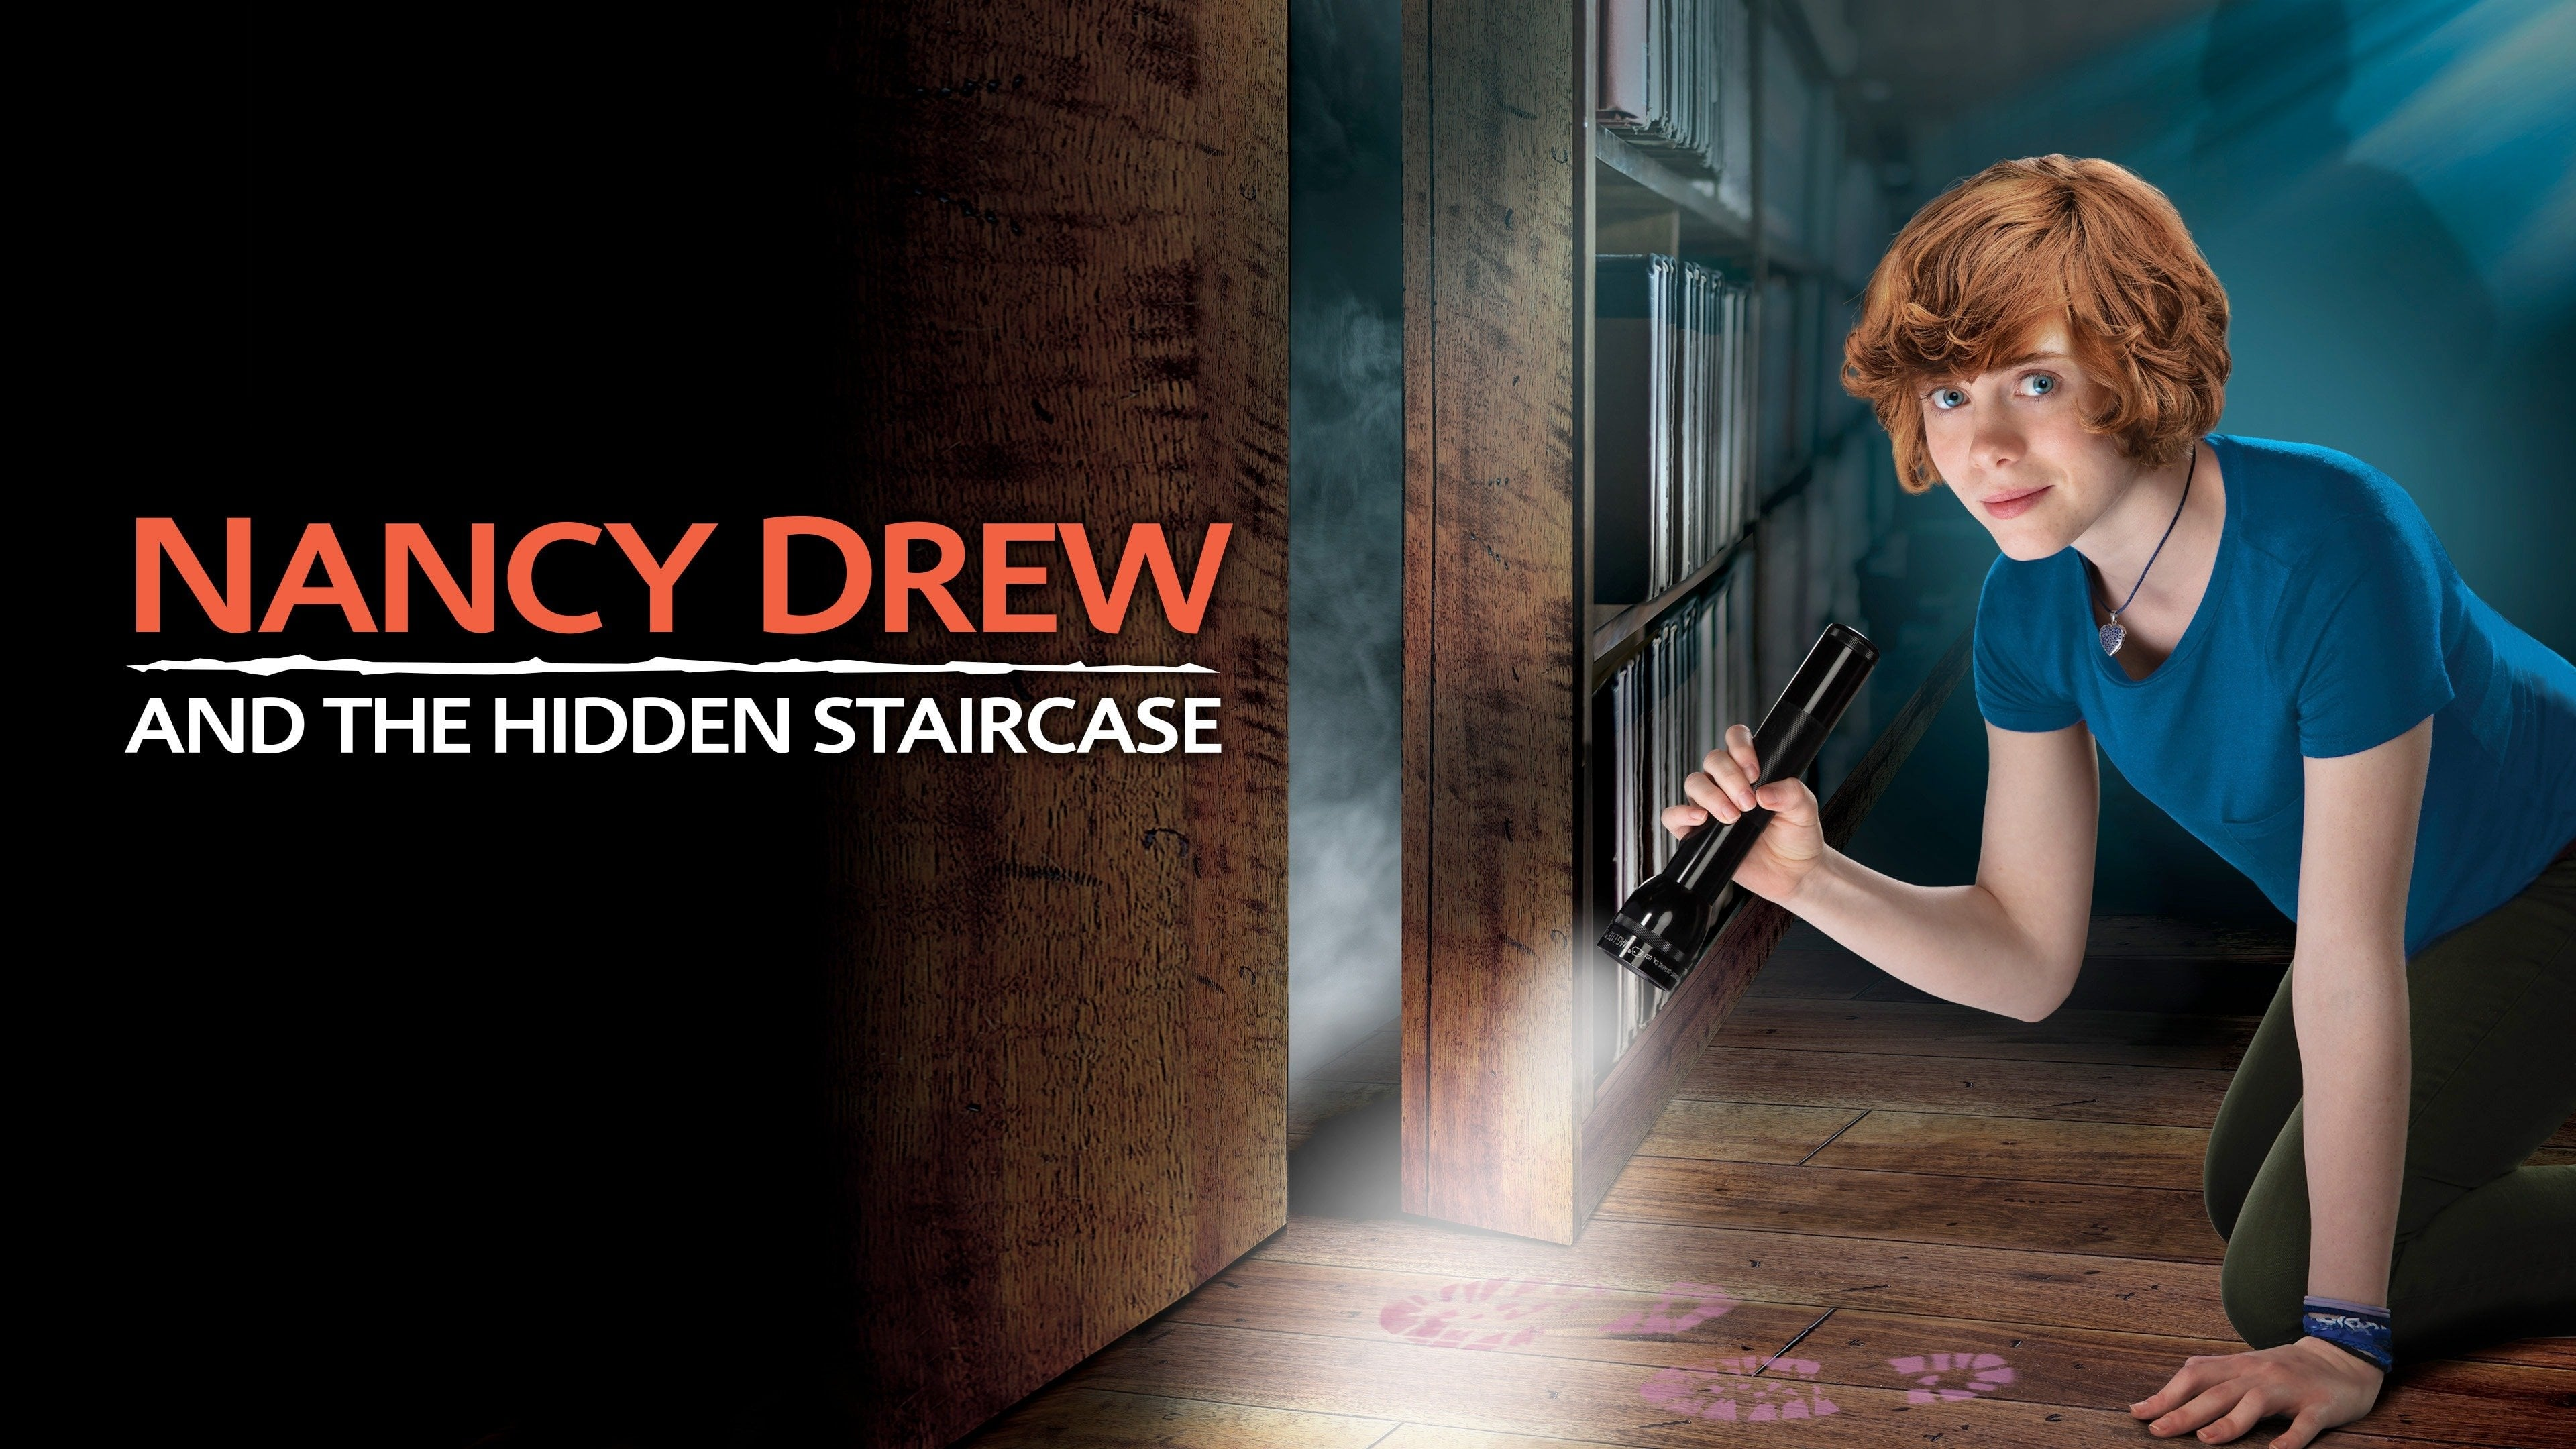 Sophia Lillis in Nancy Drew and the Hidden Staircase (2019)